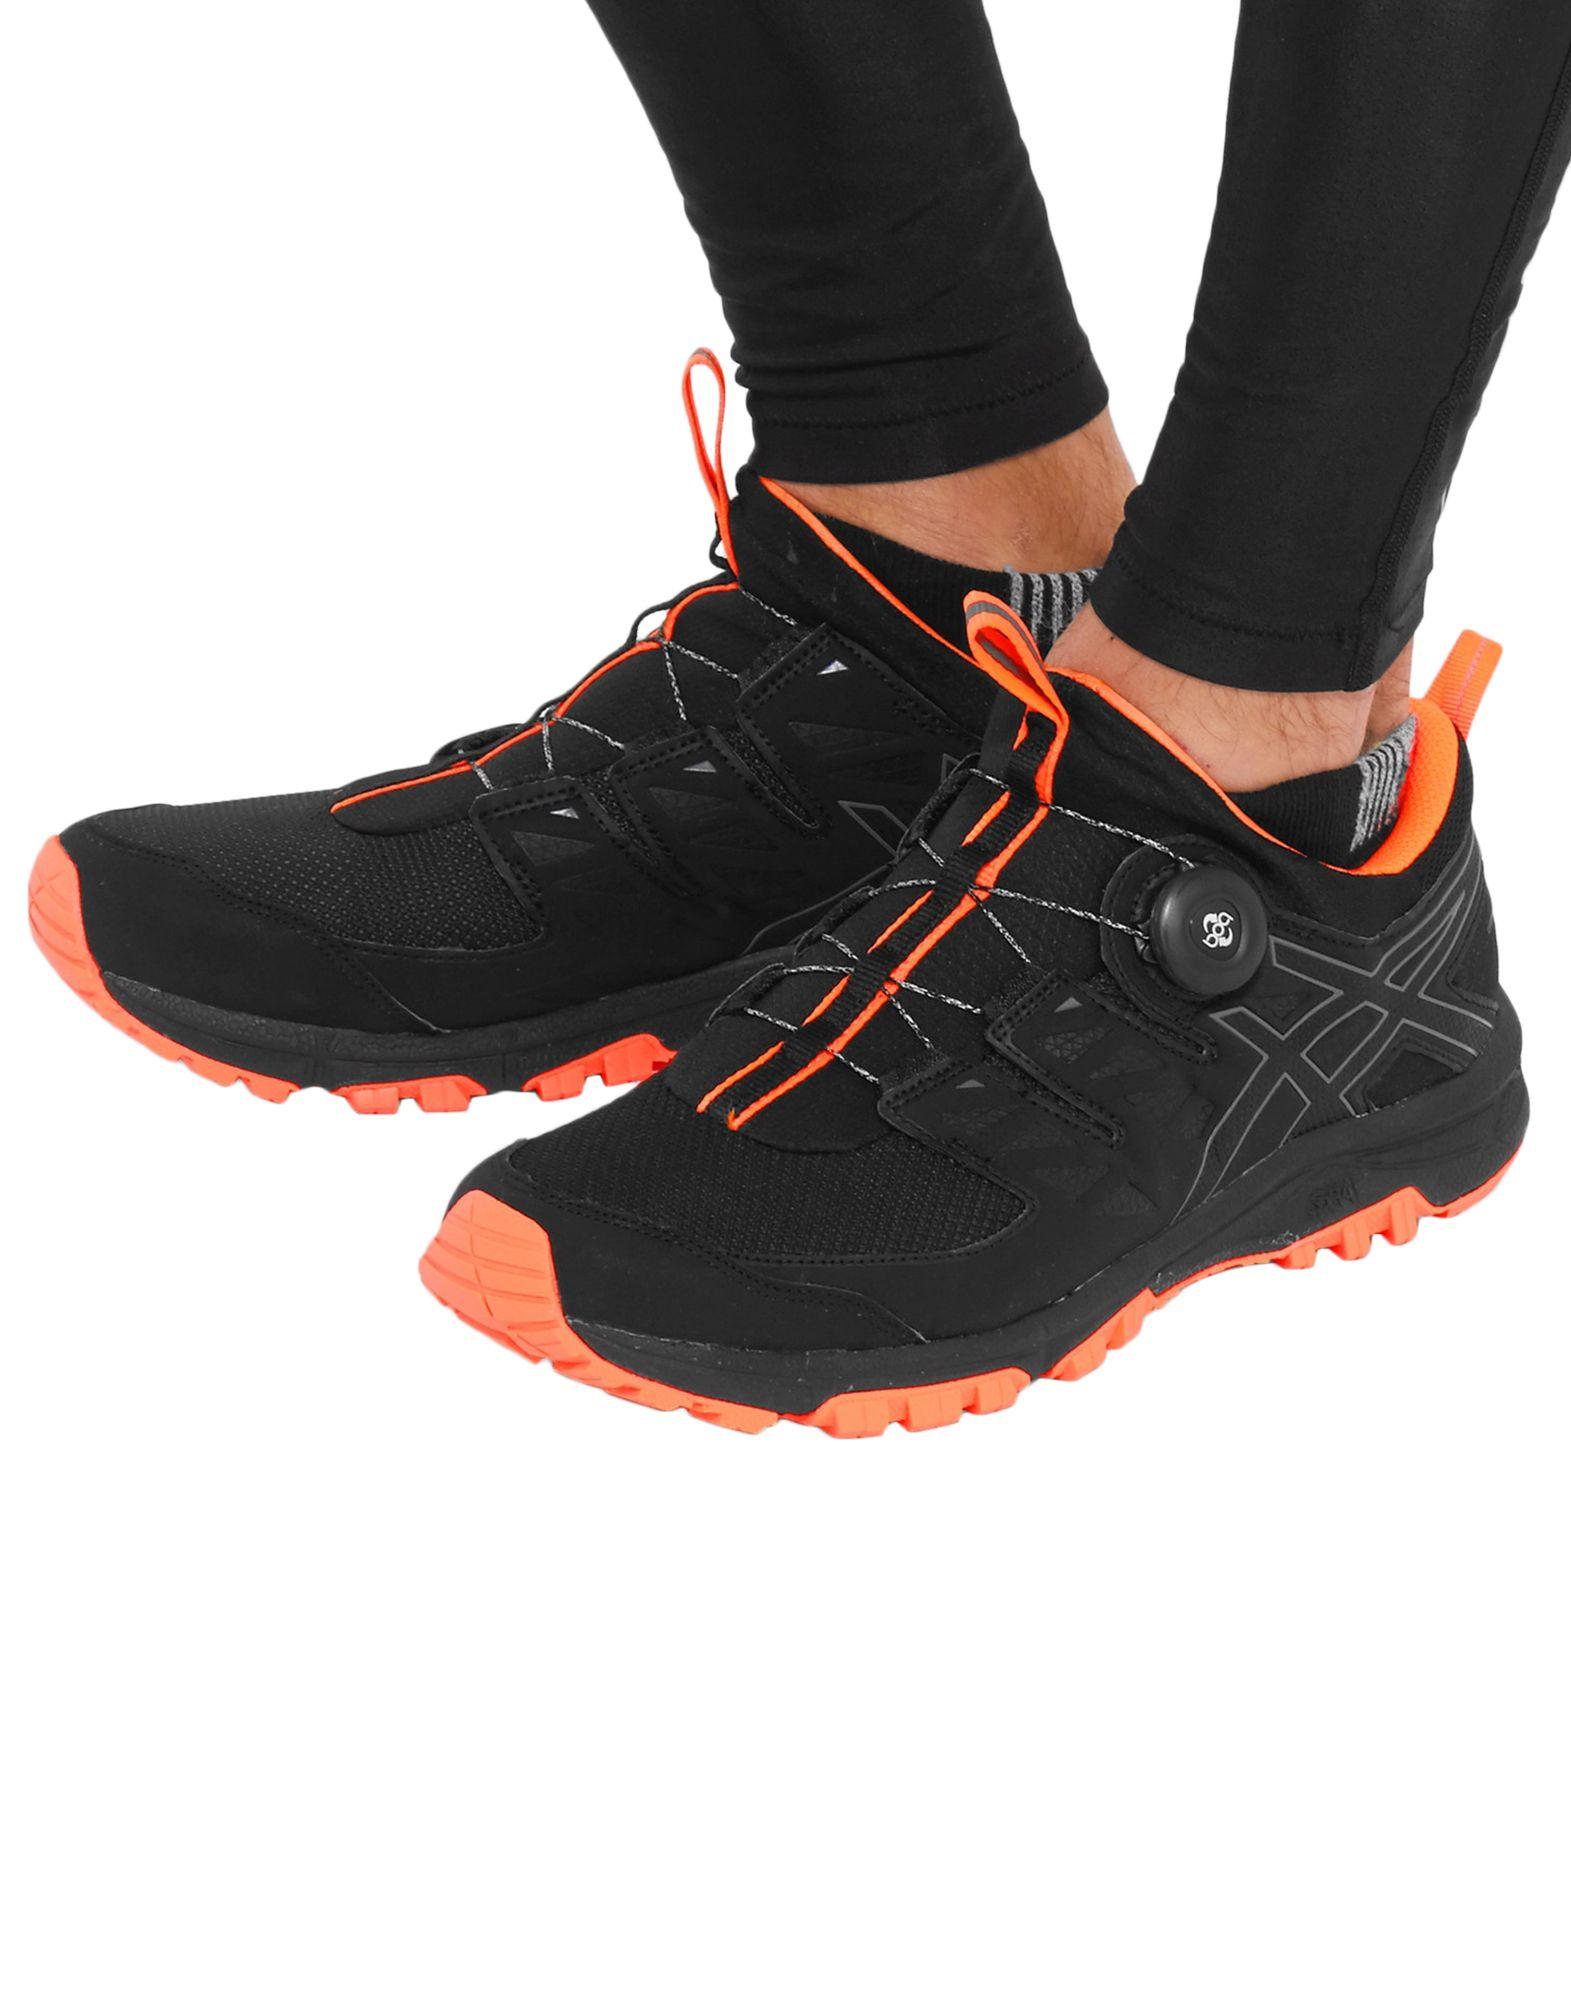 Rabatt Asics echte Schuhe Asics Rabatt Sneakers Herren  11540954TD 33f47d